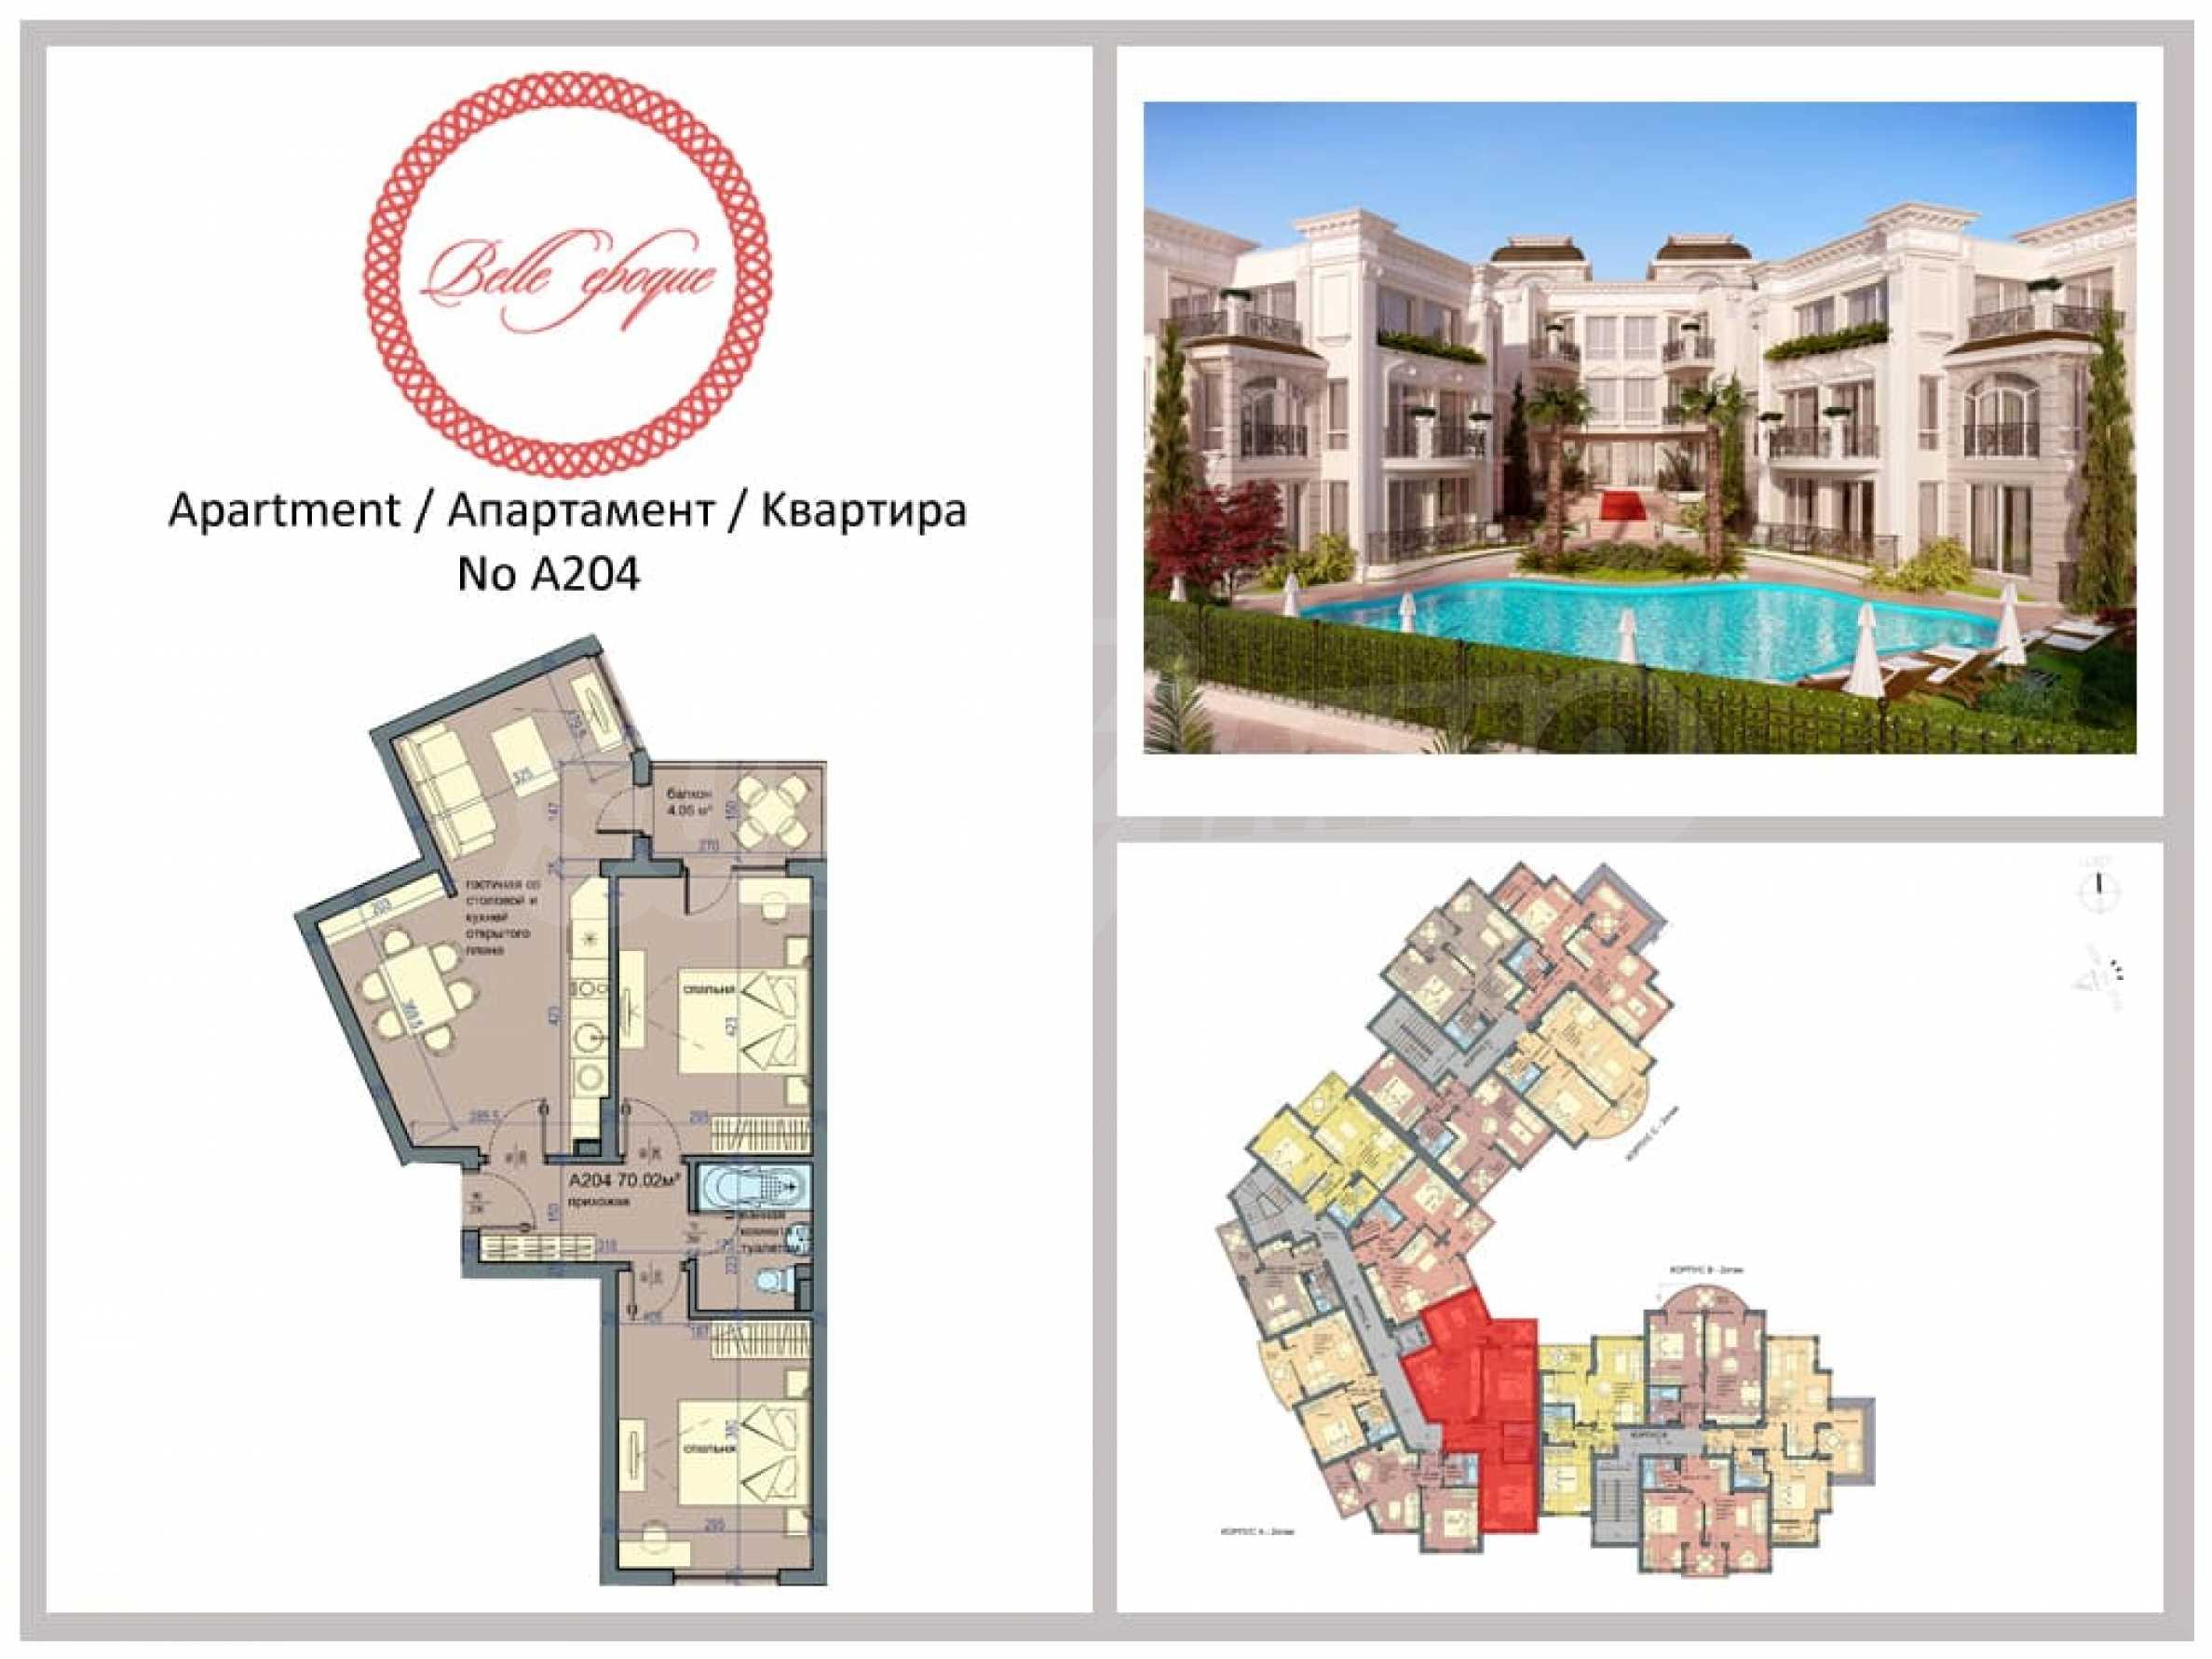 Дизайнерски тристаен апартамент под наем за летен сезон в резиденция Belle Époque в Лозенец 51